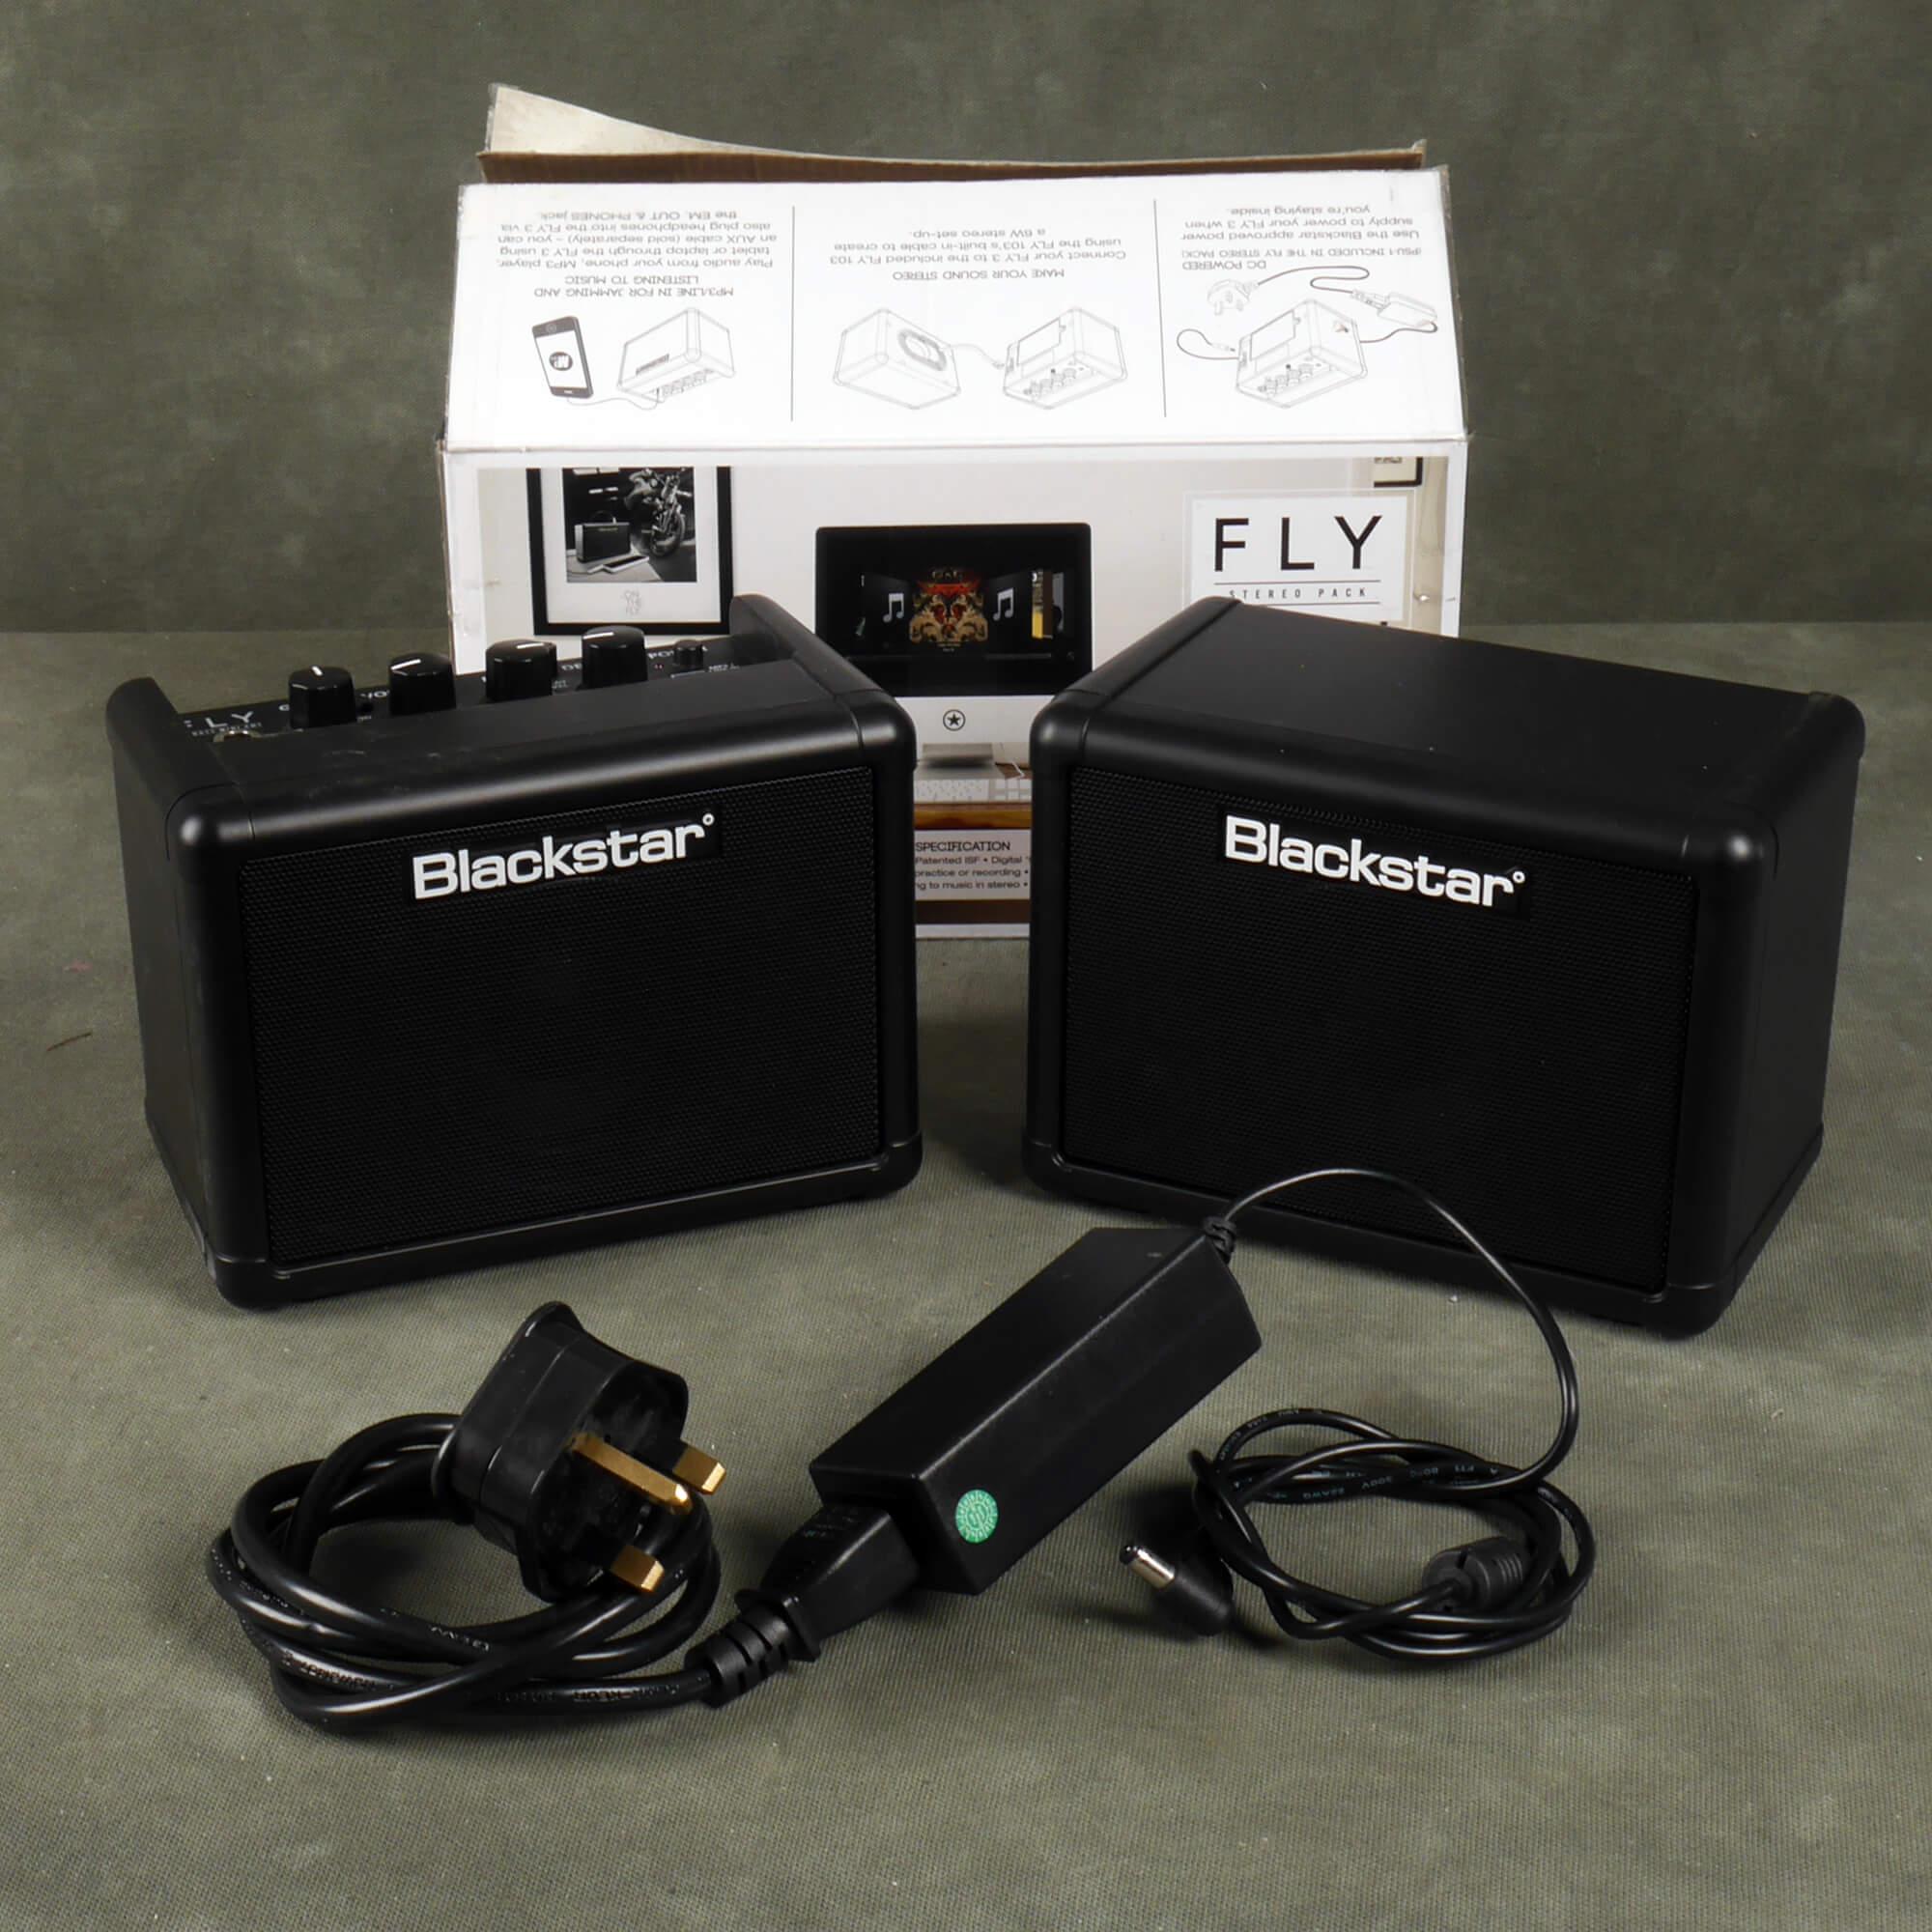 Blackstar Fly 3 Stereo Pack w/Box & PSU - 2nd Hand